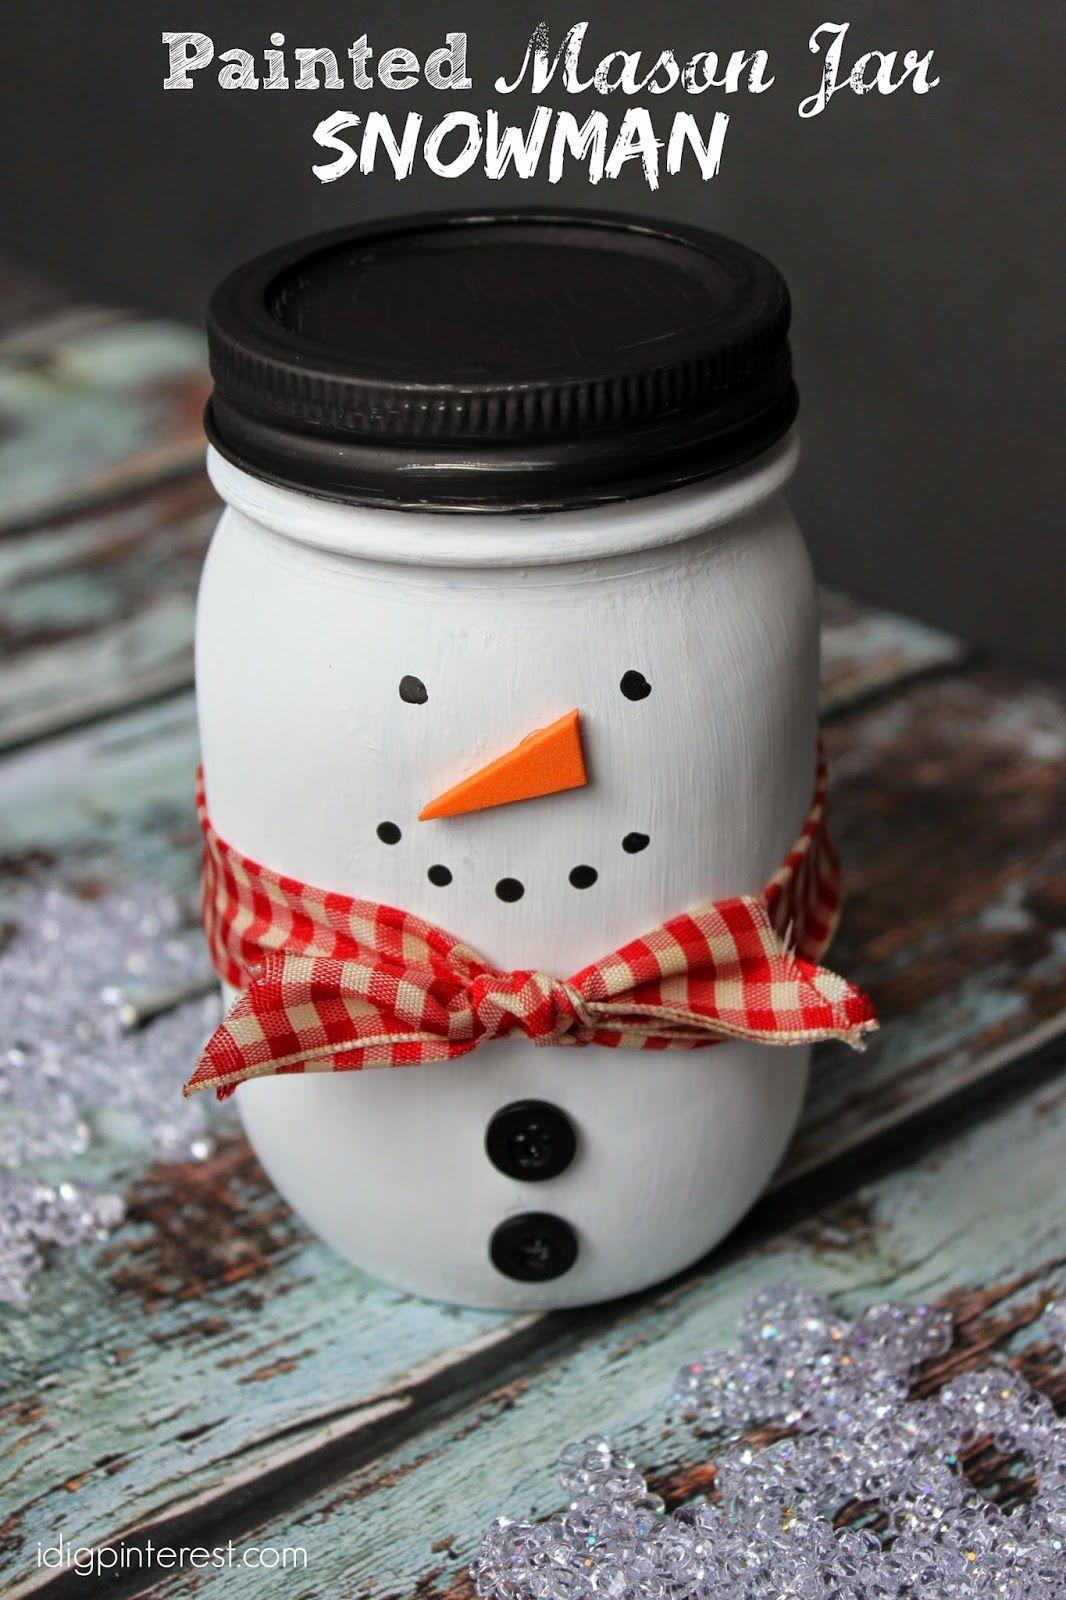 I Dig Pinterest Painted Mason Jar Snowman Craft Gift Christmas Jars Mason Jar Snowman Christmas Mason Jars